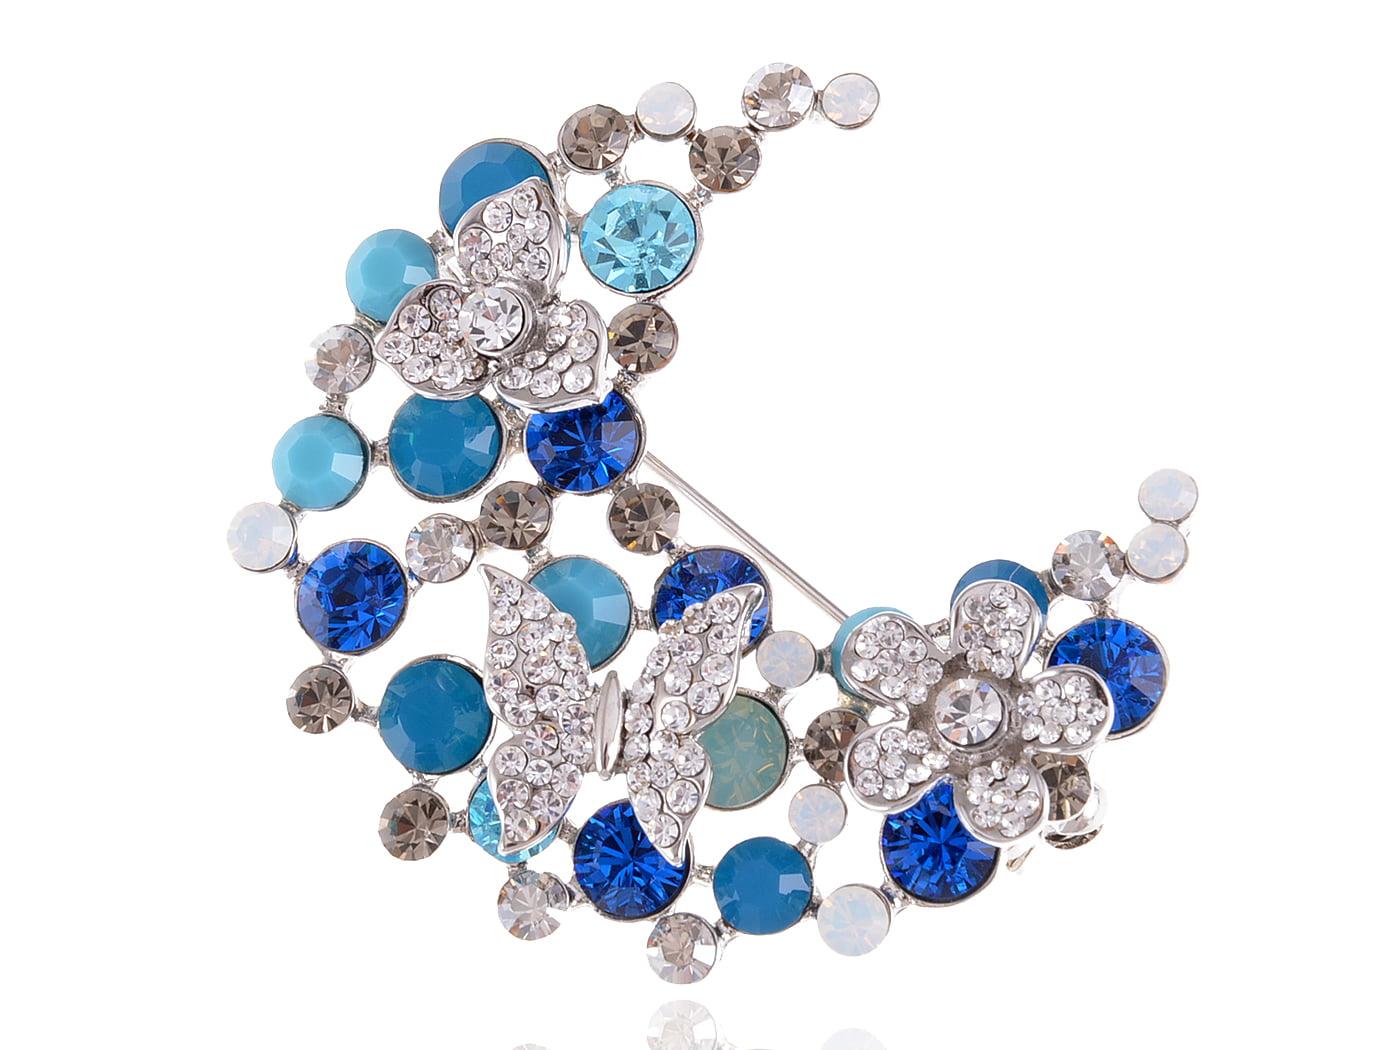 Blue Butterfly Flower Crescent Half Moon Crystal Rhinestone Pin Brooch by